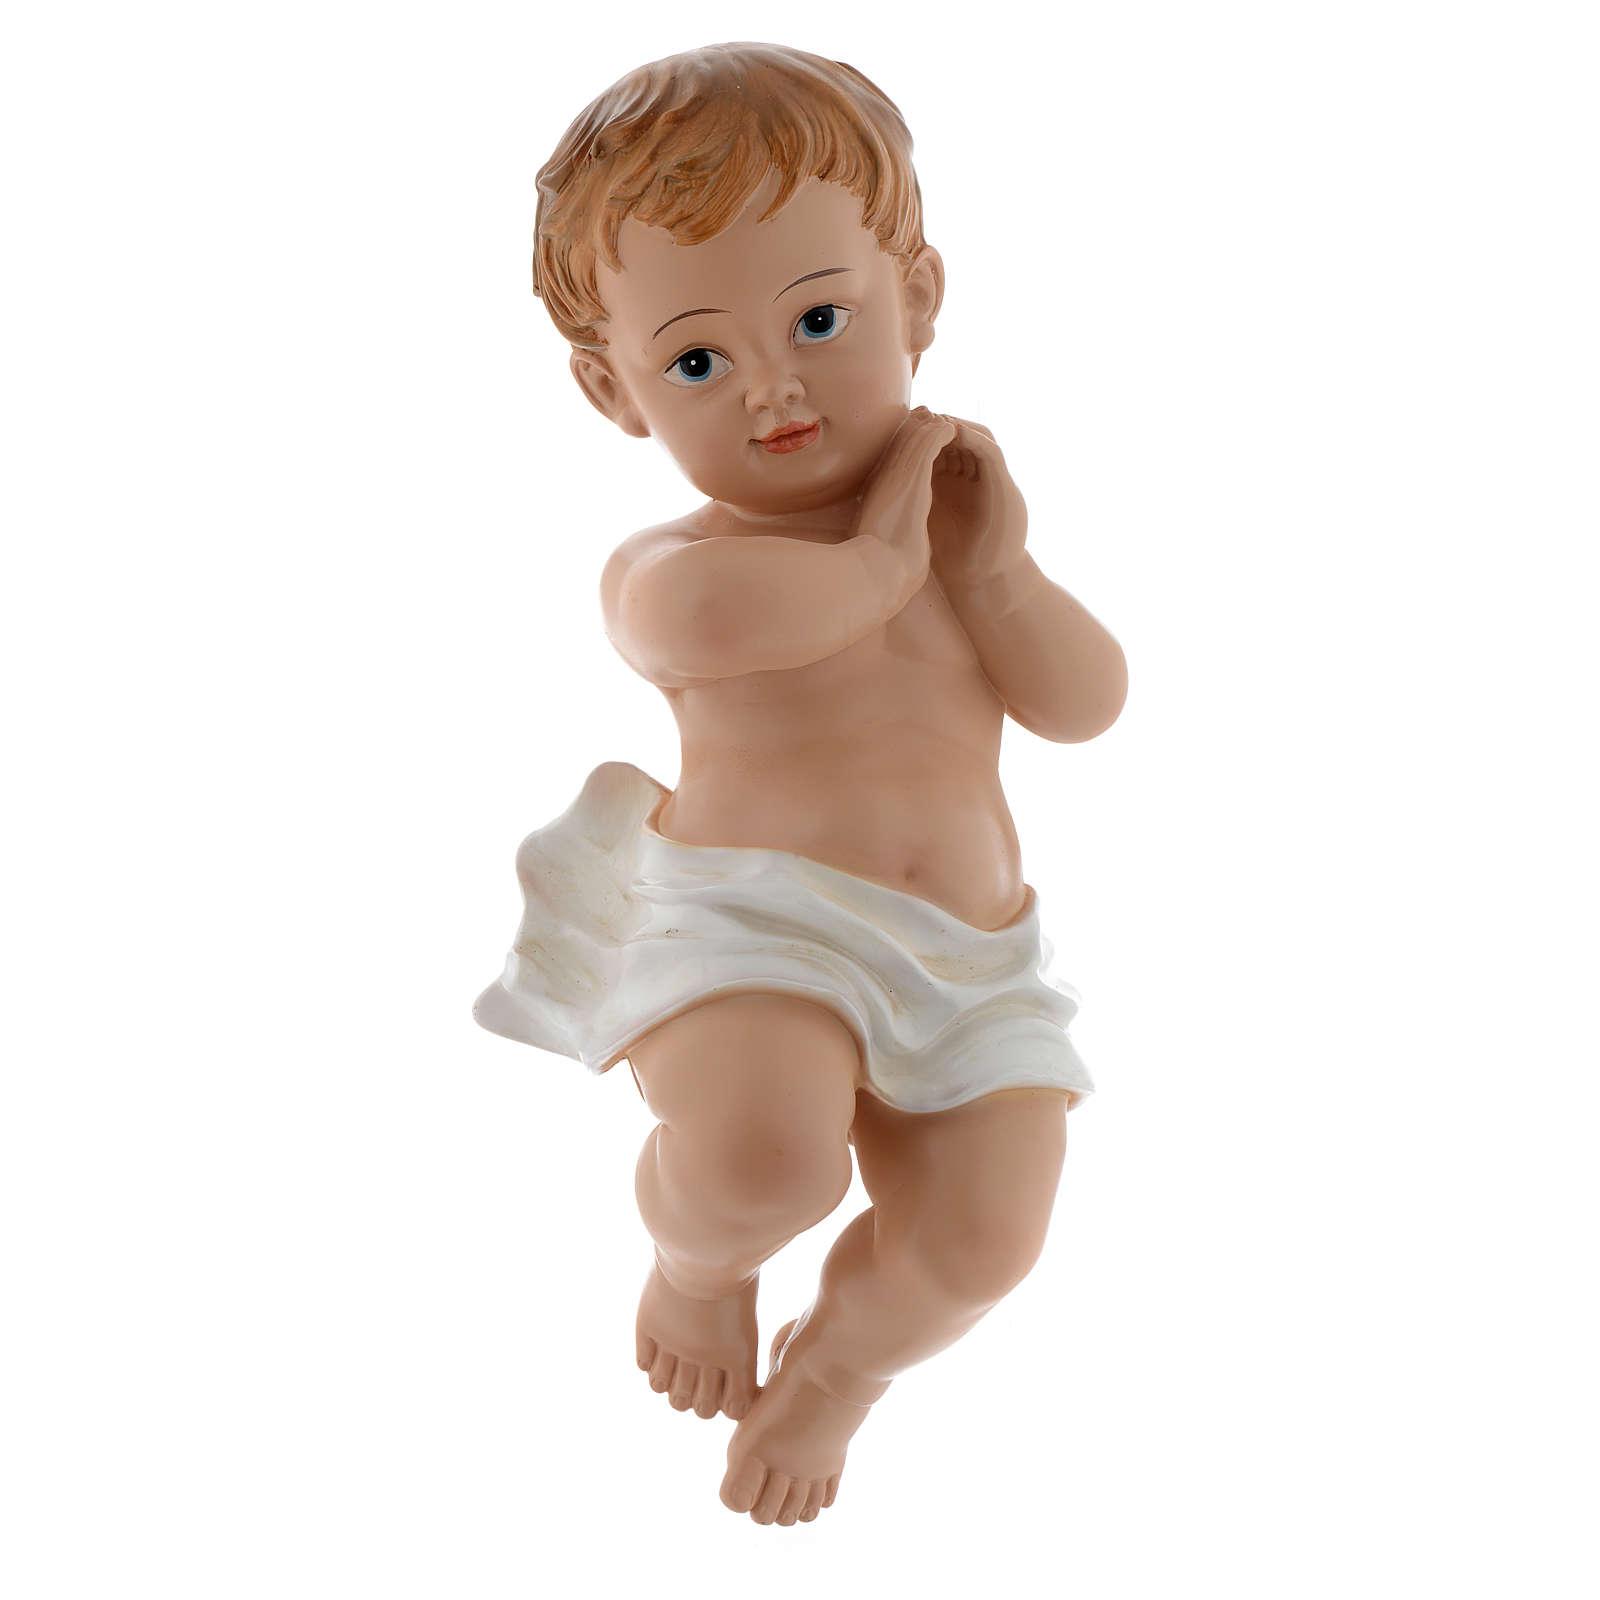 Statua Bambinello 39,5 cm resina 3